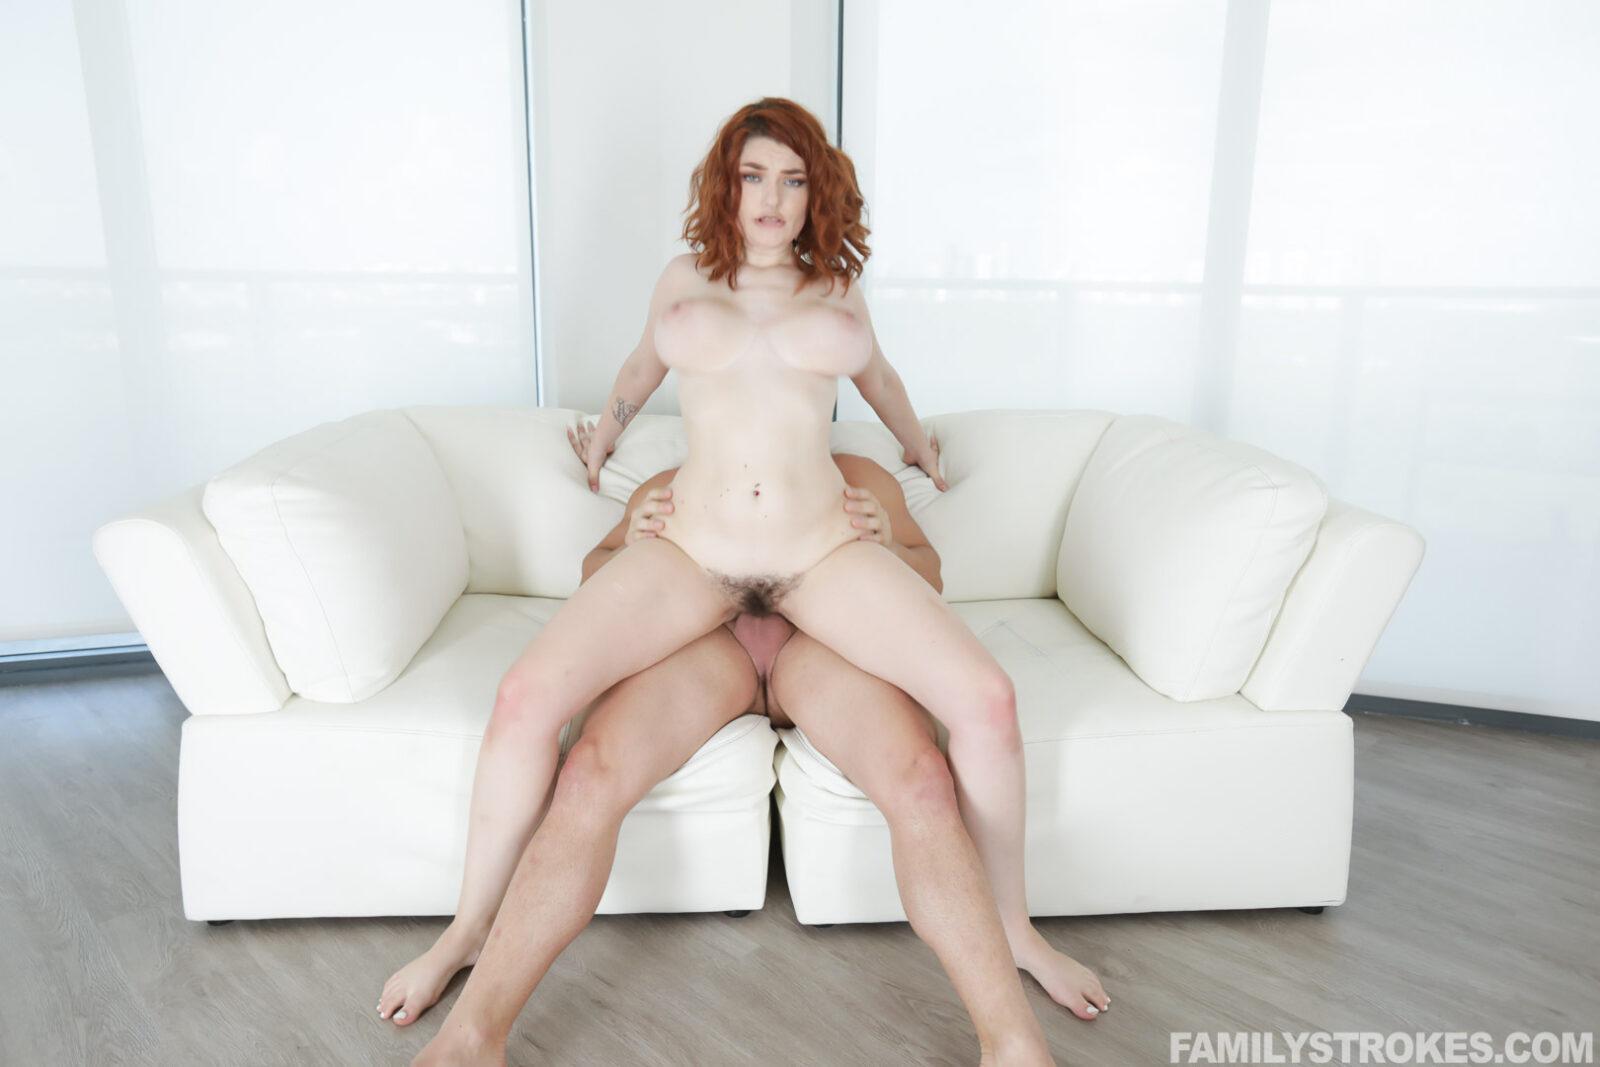 Annabel Redd - Family Strokes